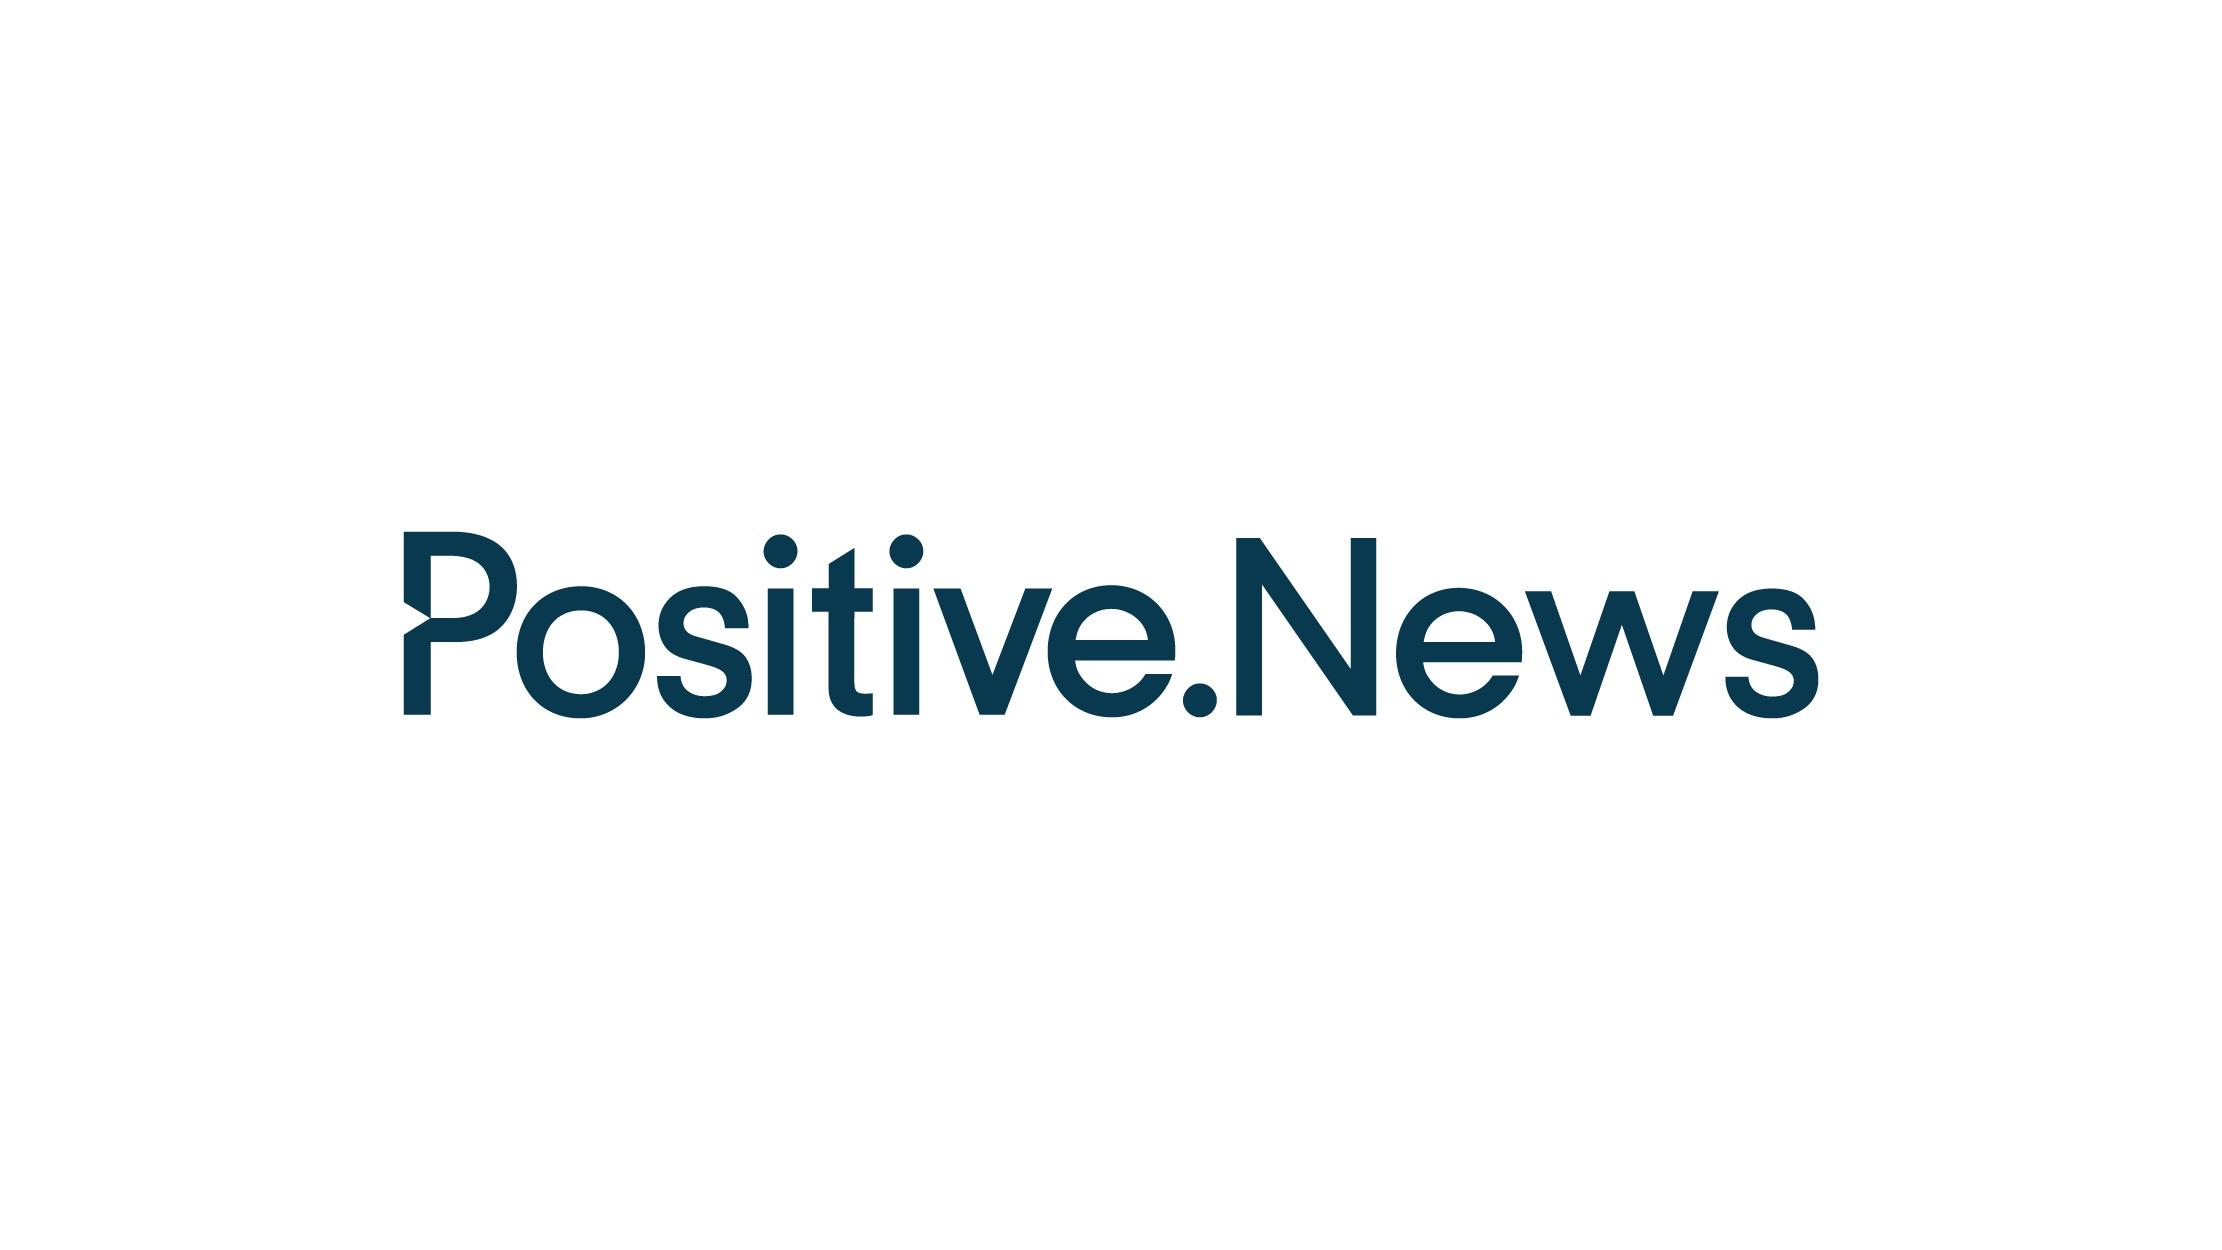 Logo - Positive News.png